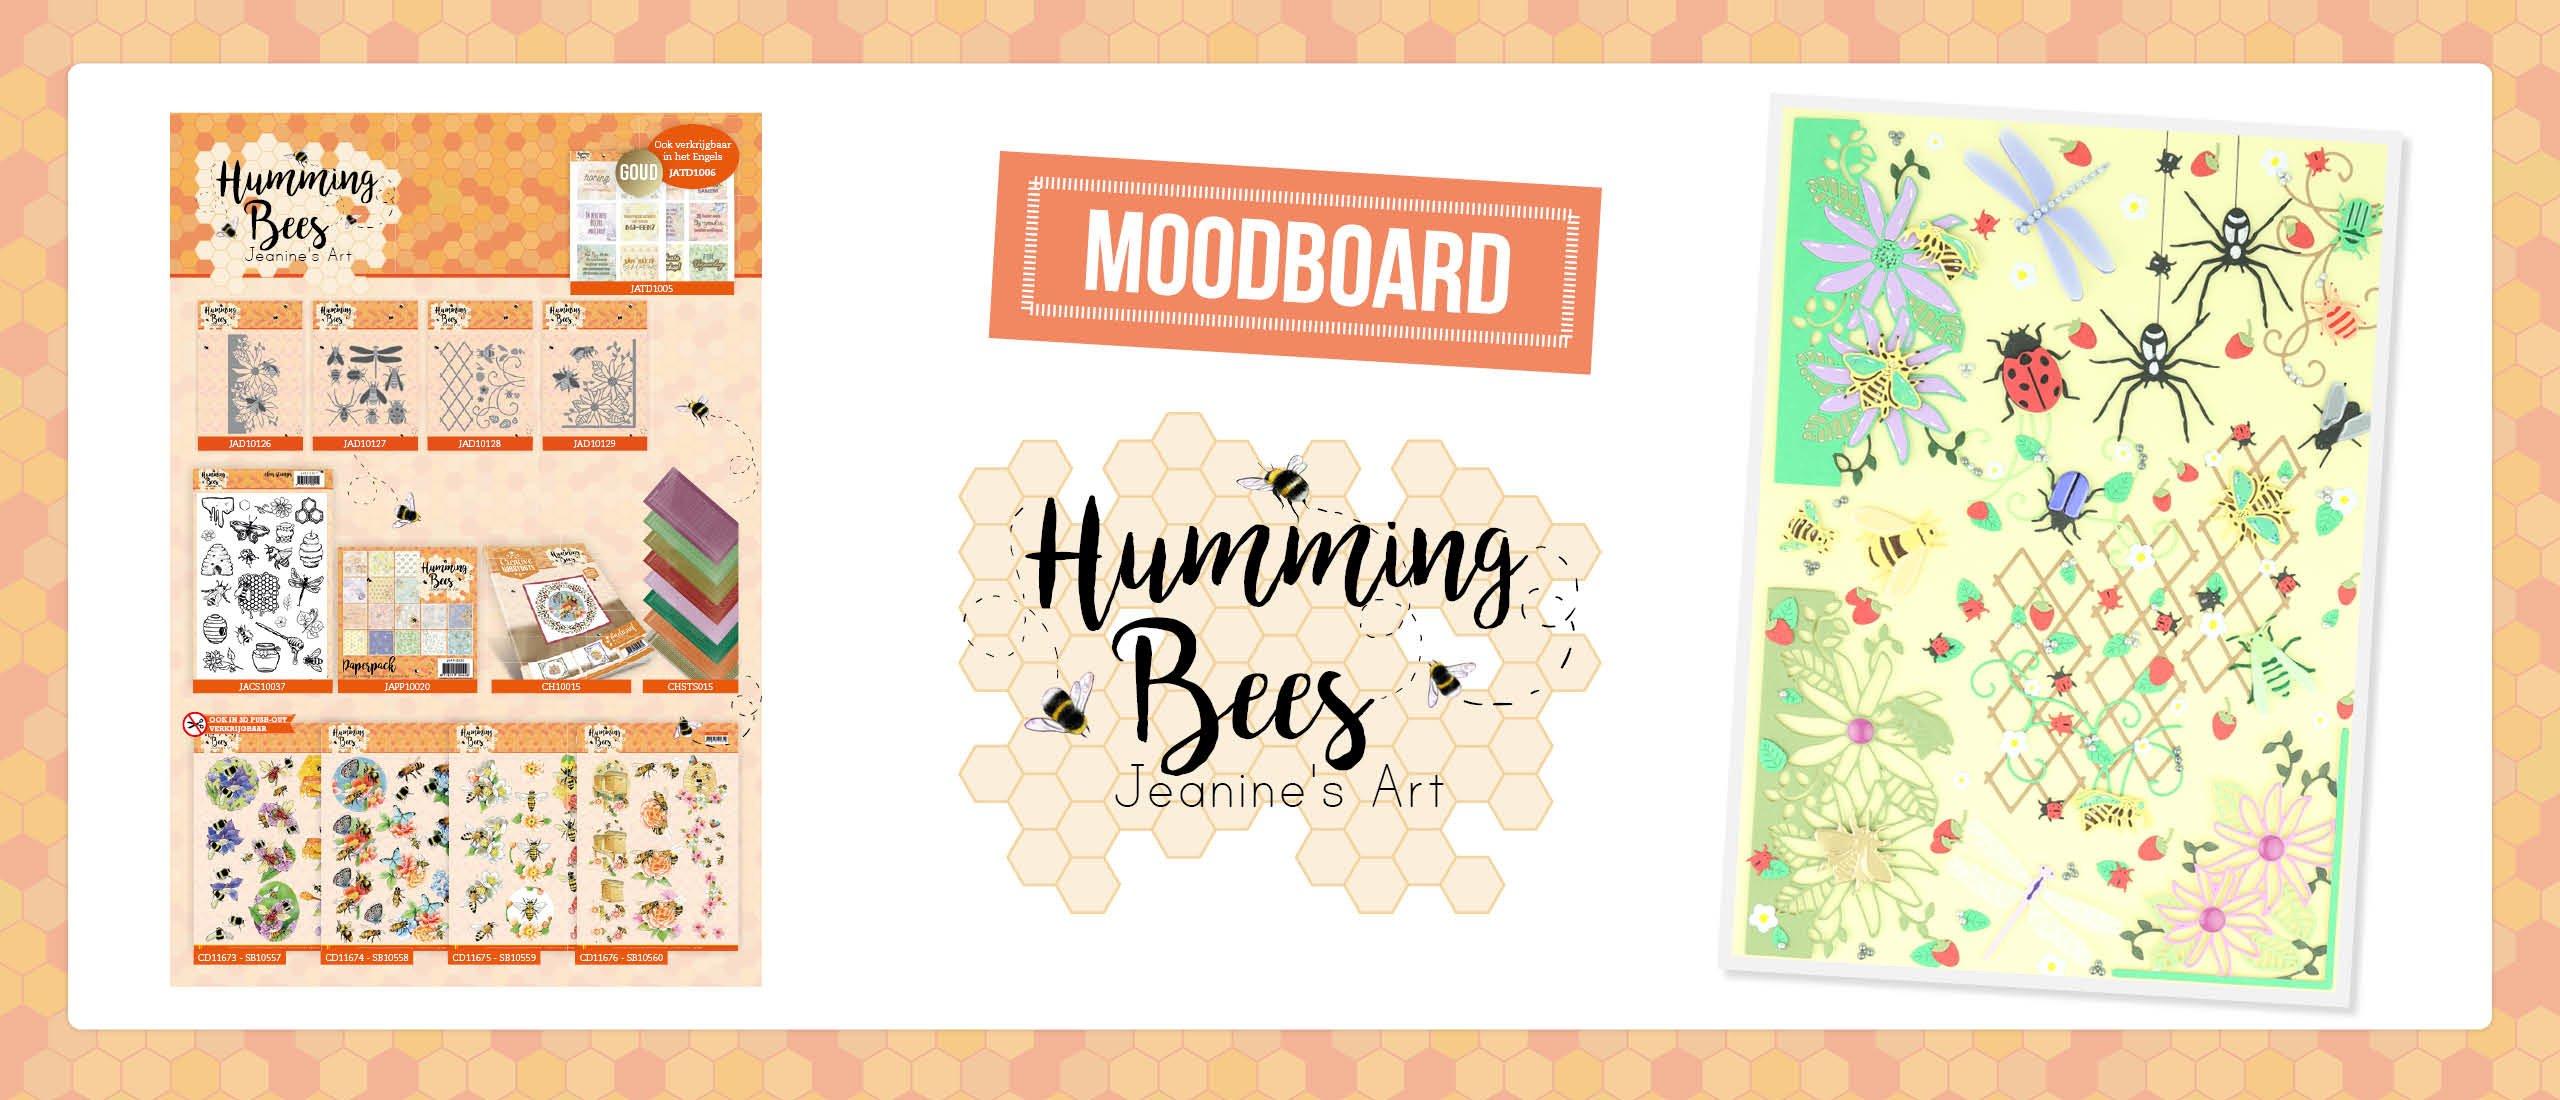 Moodboard jeanine's Art - Humming Bees